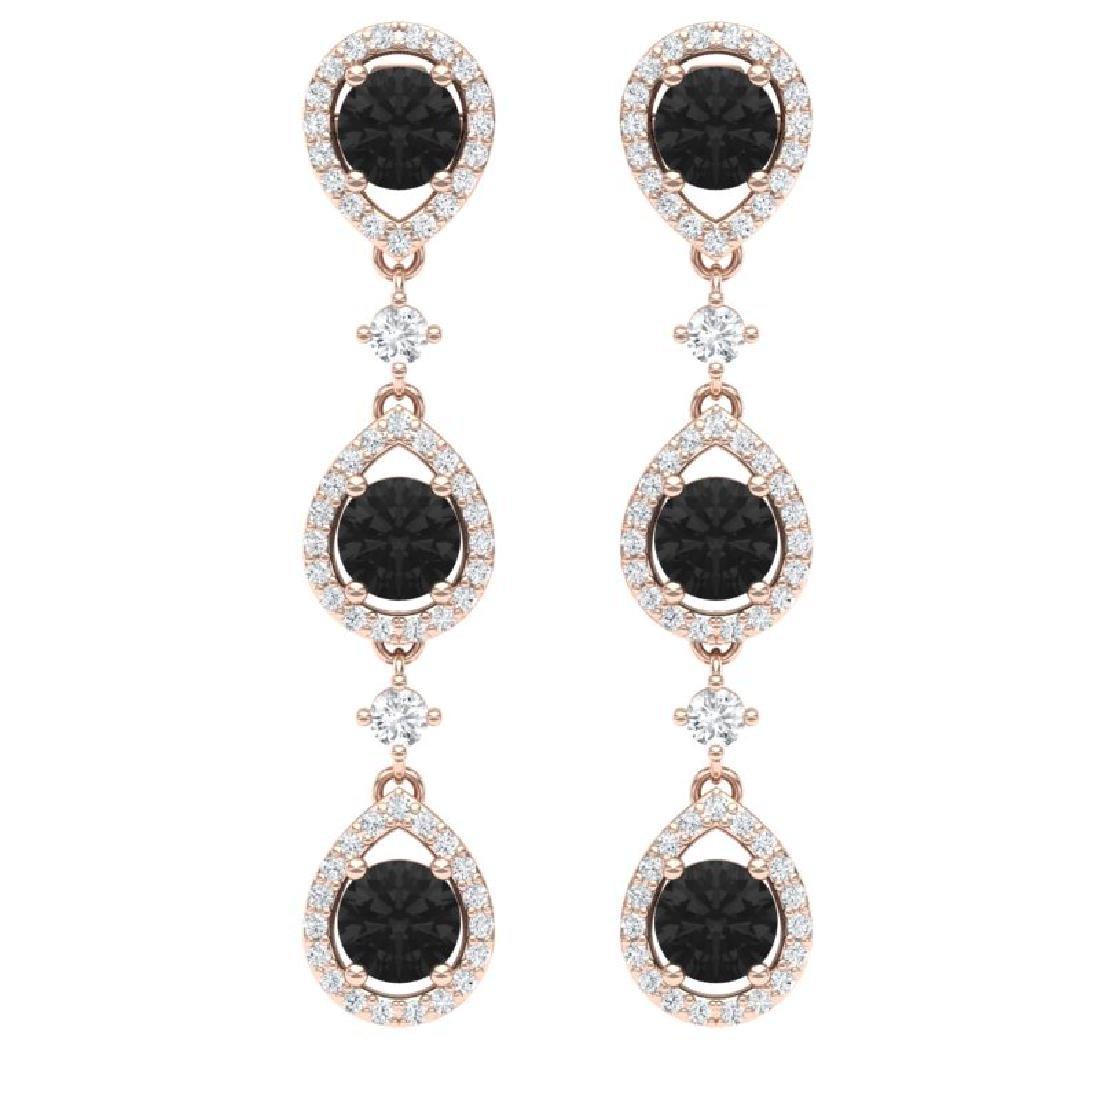 4.7 CTW Certified Black VS Diamond Earrings 18K Rose